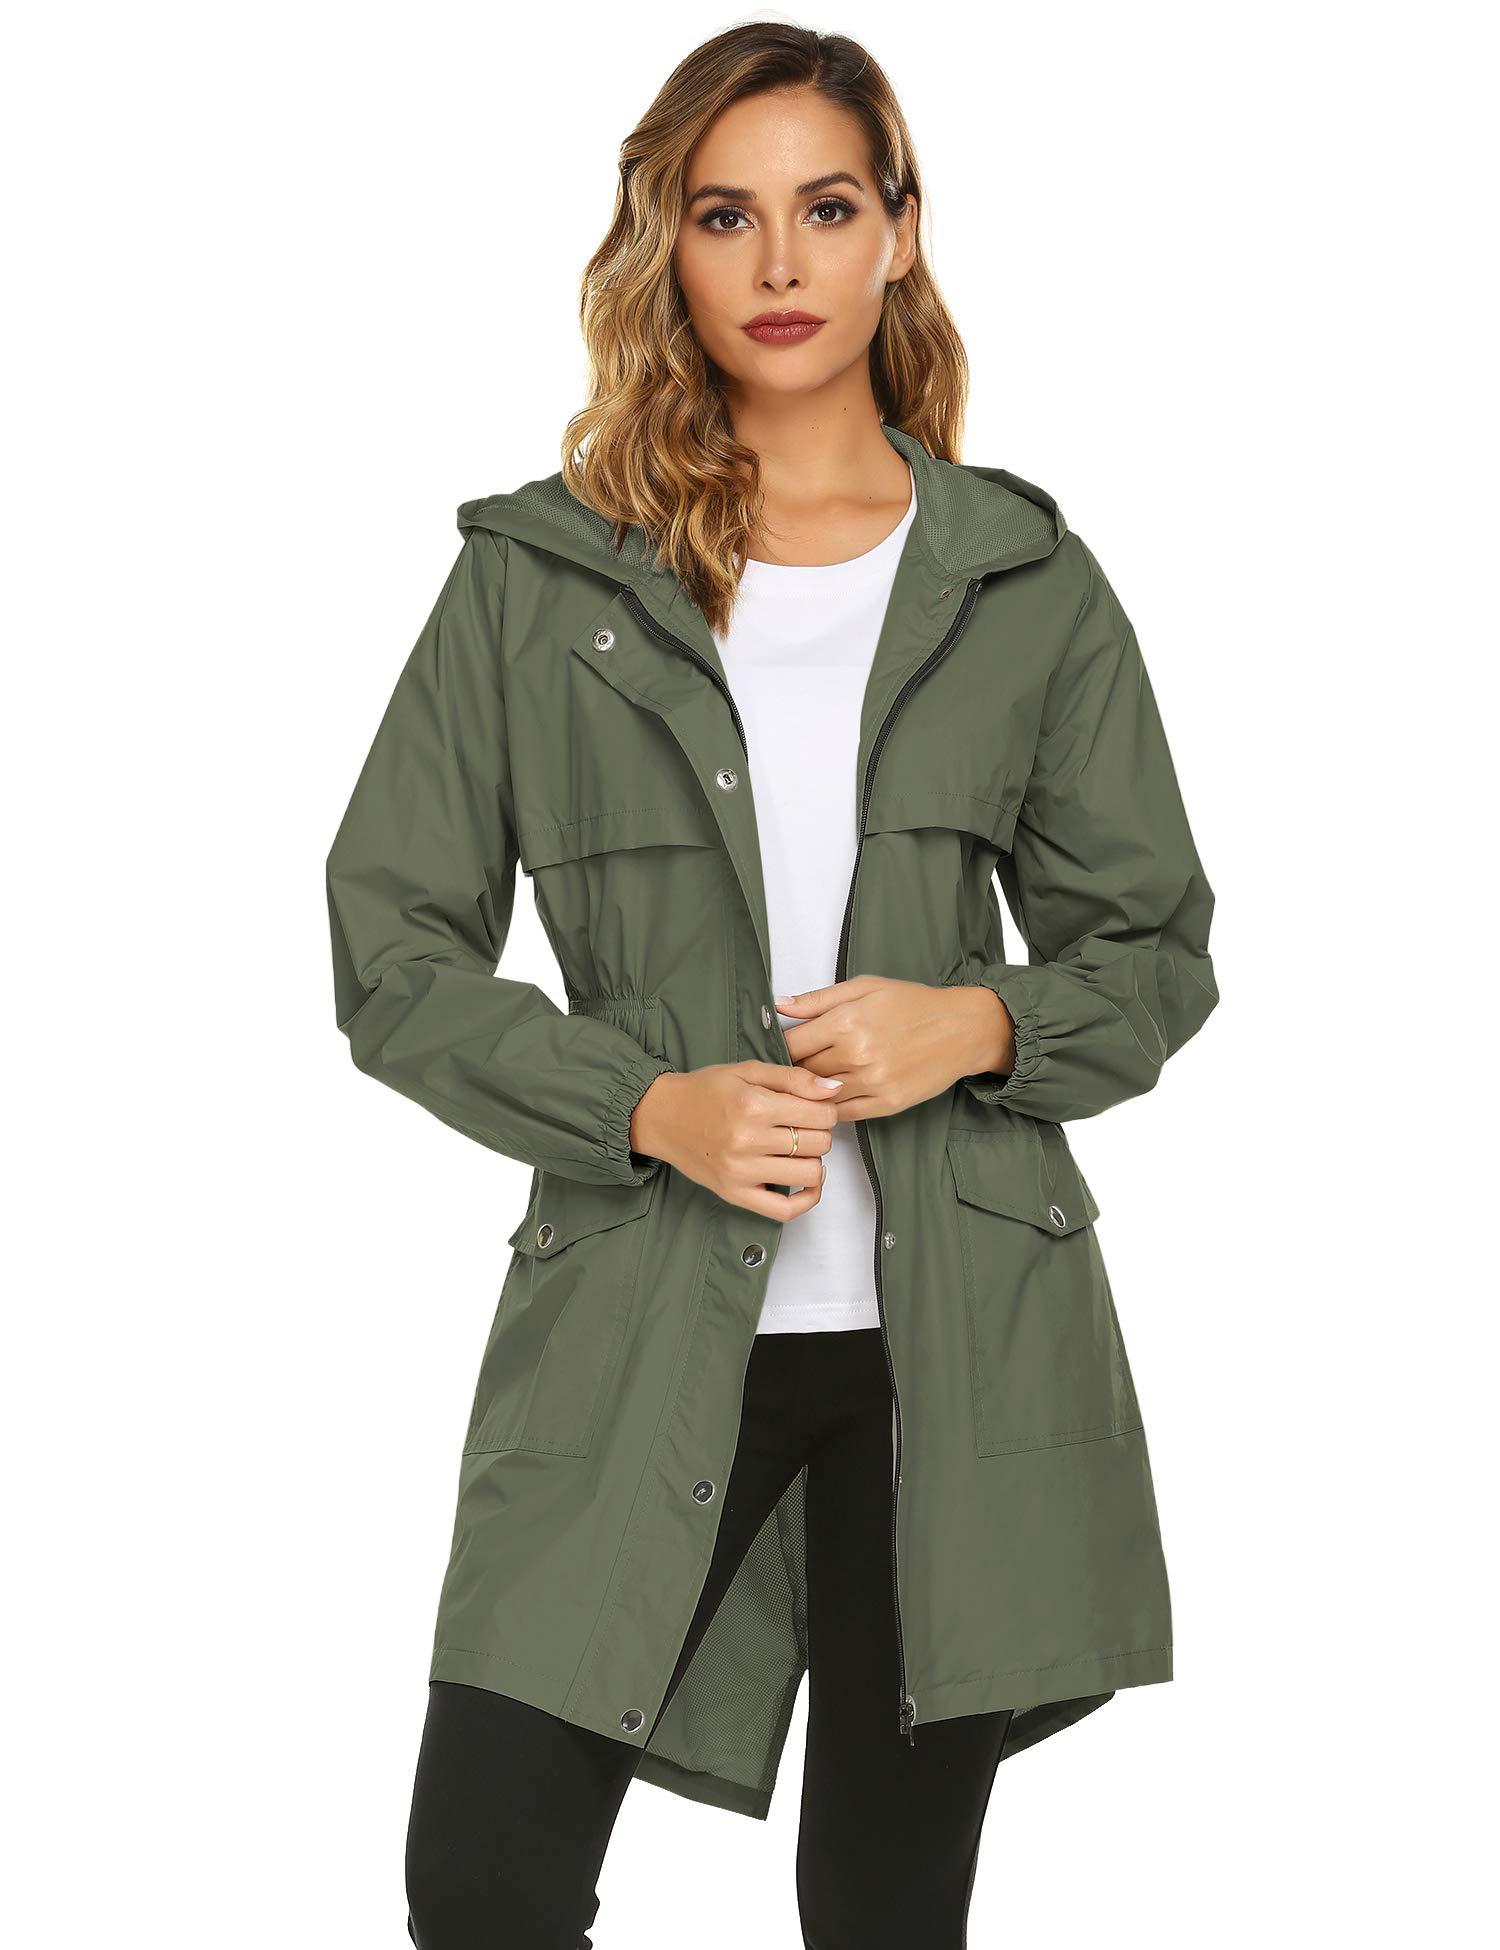 Avoogue Womens Rain Coat Waterproof Lightweight Rain Jacket Active Hooded Women's Trench Coats Army Green by Avoogue